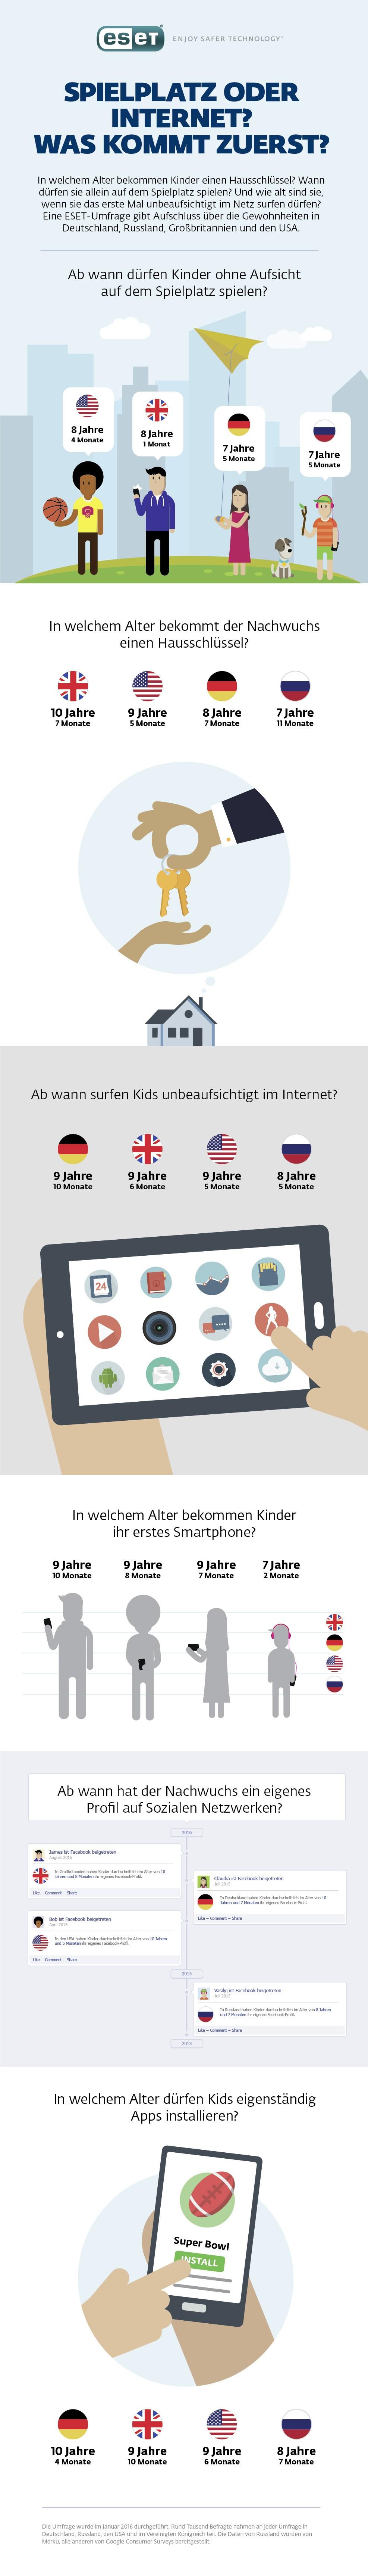 infografik-eset-kinder-digital-einstieg